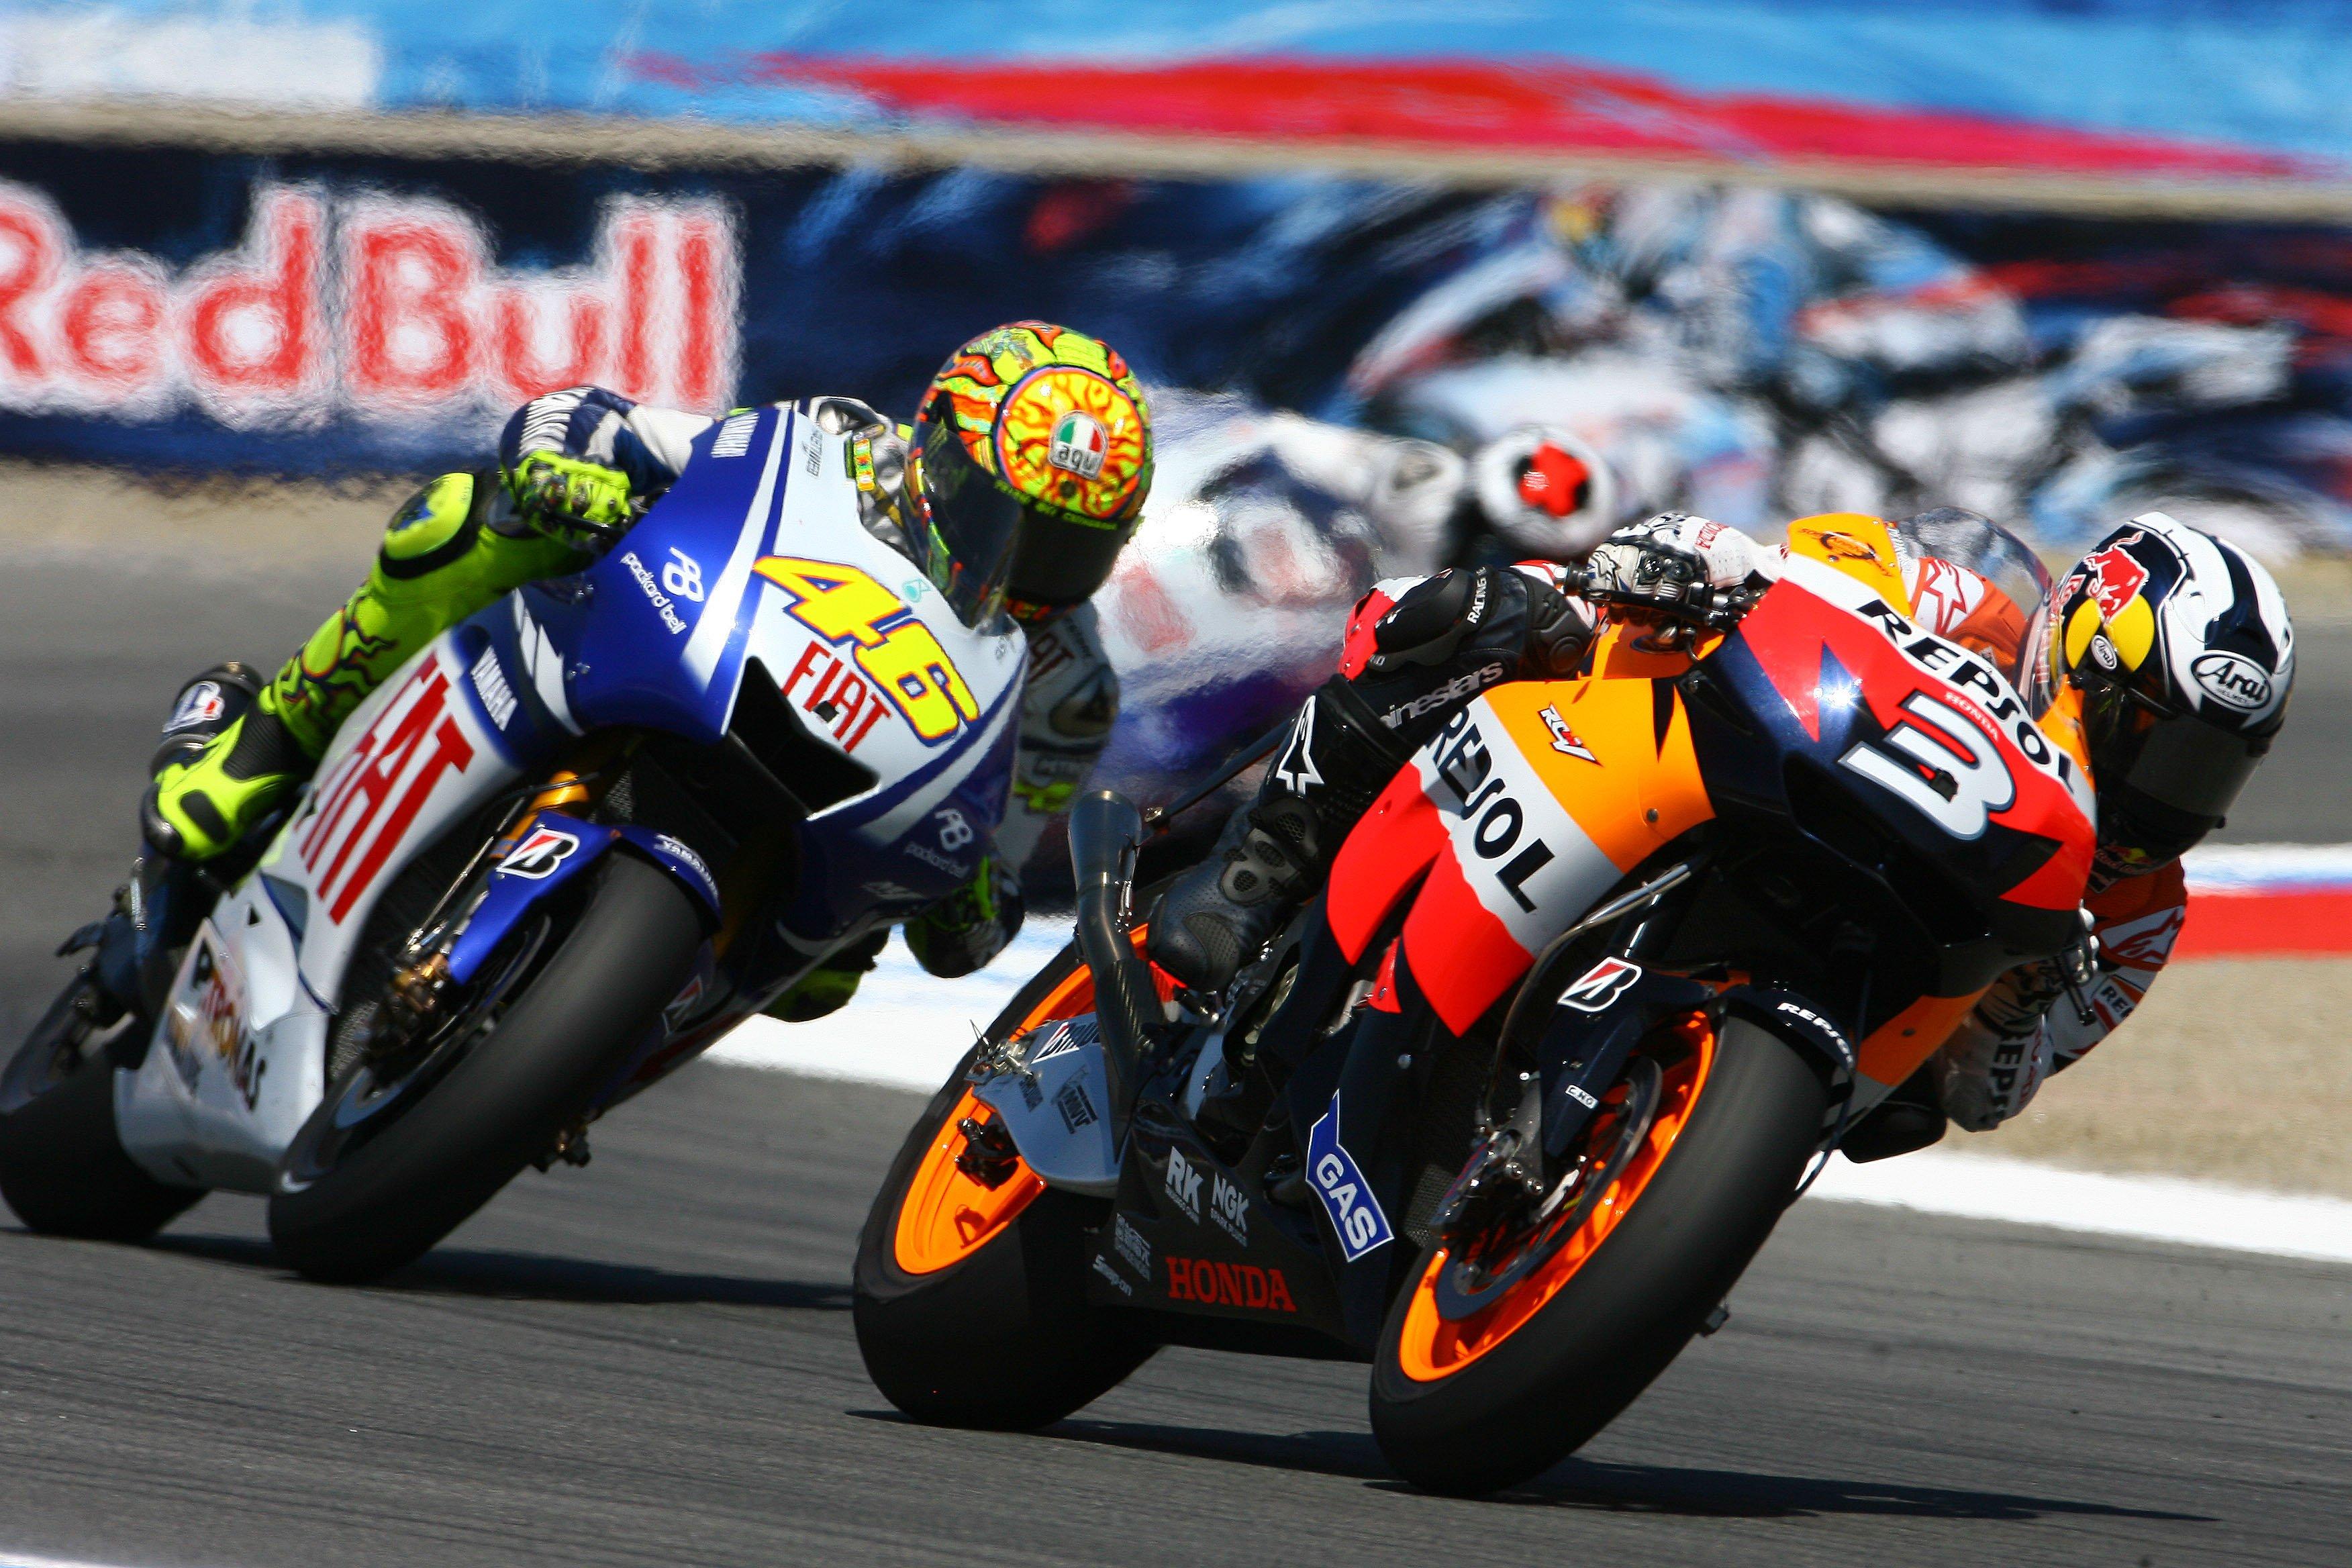 Racing Motorcycle Wallpapers Wallpaper Cave